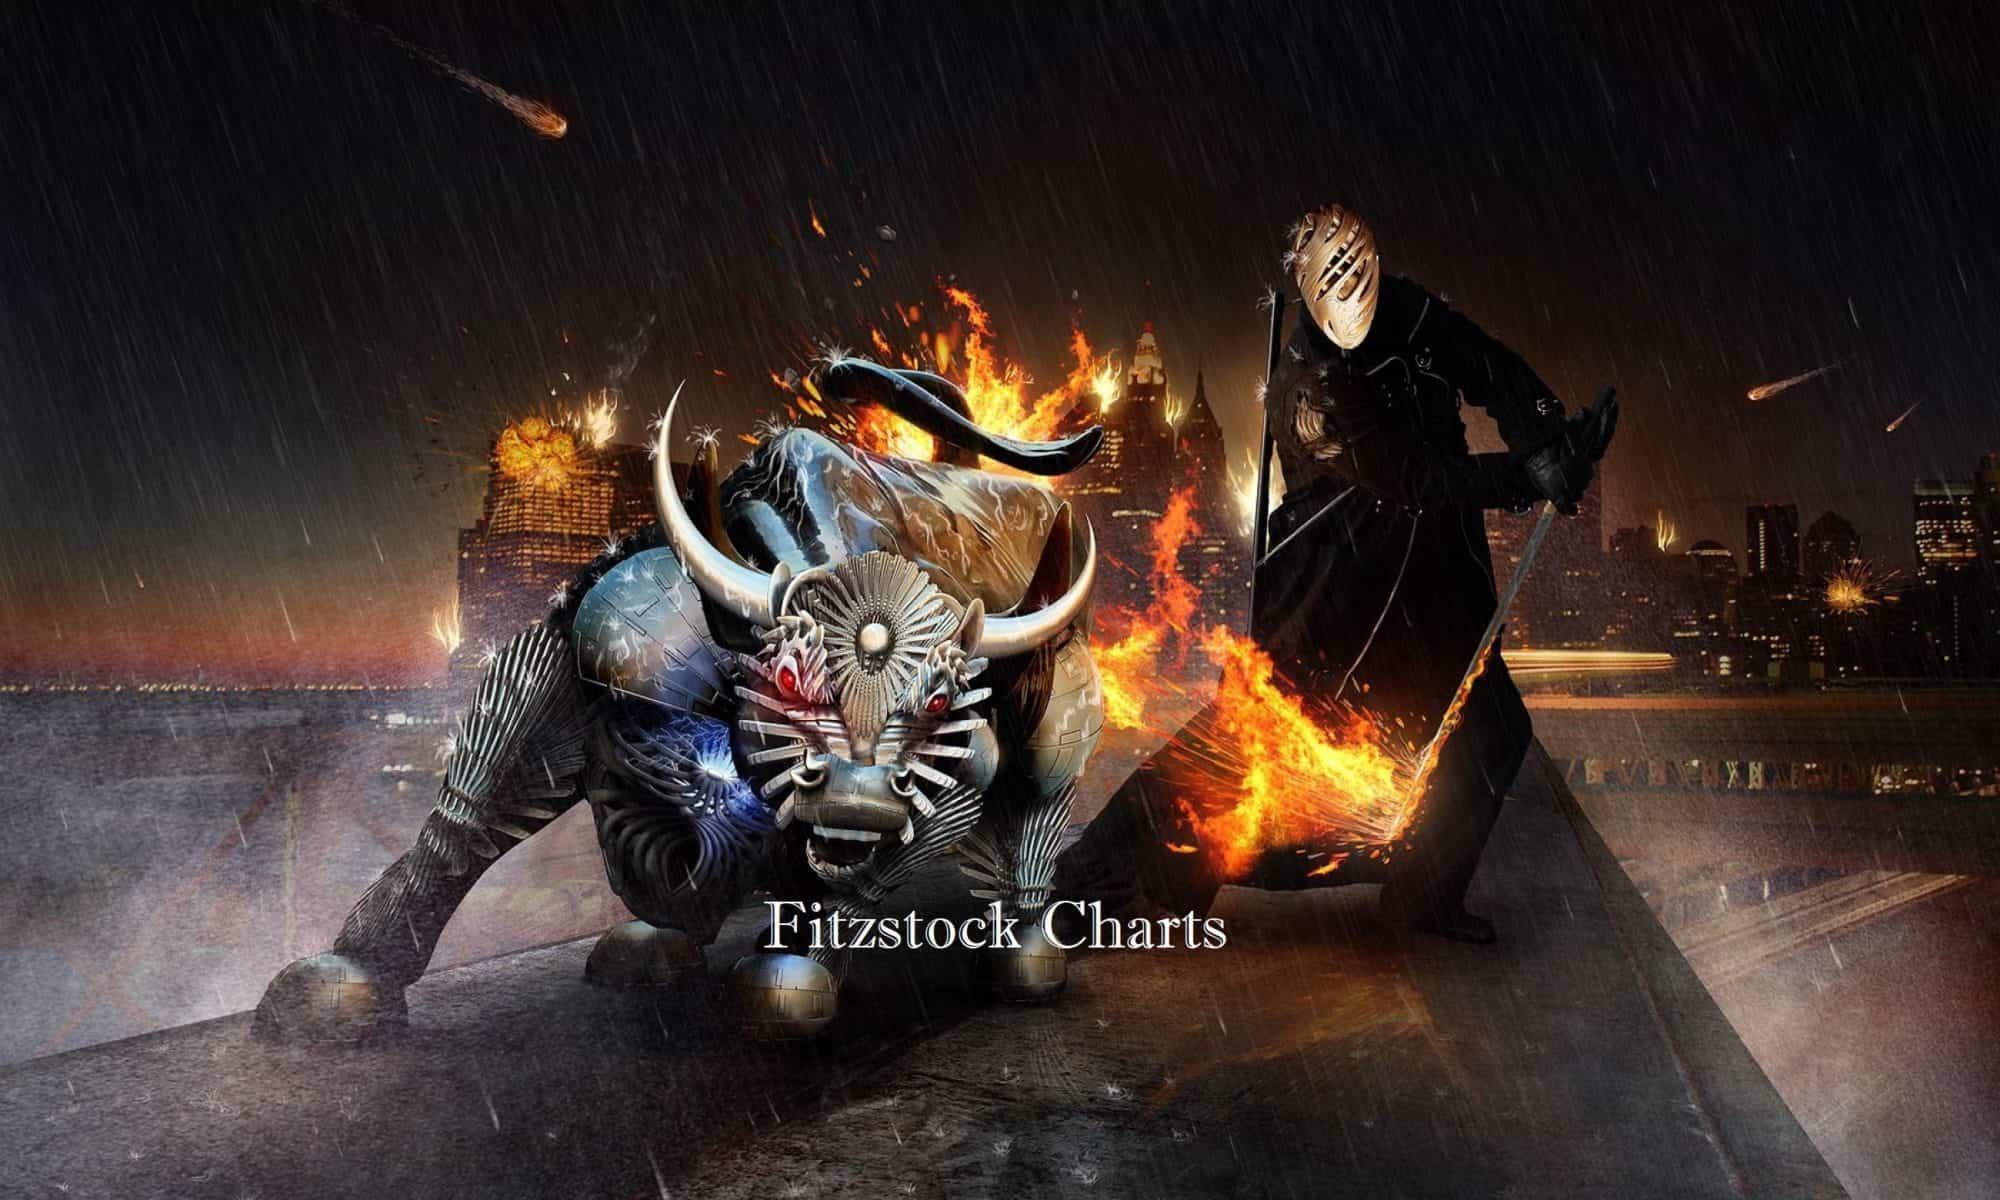 Fitzstock Charts